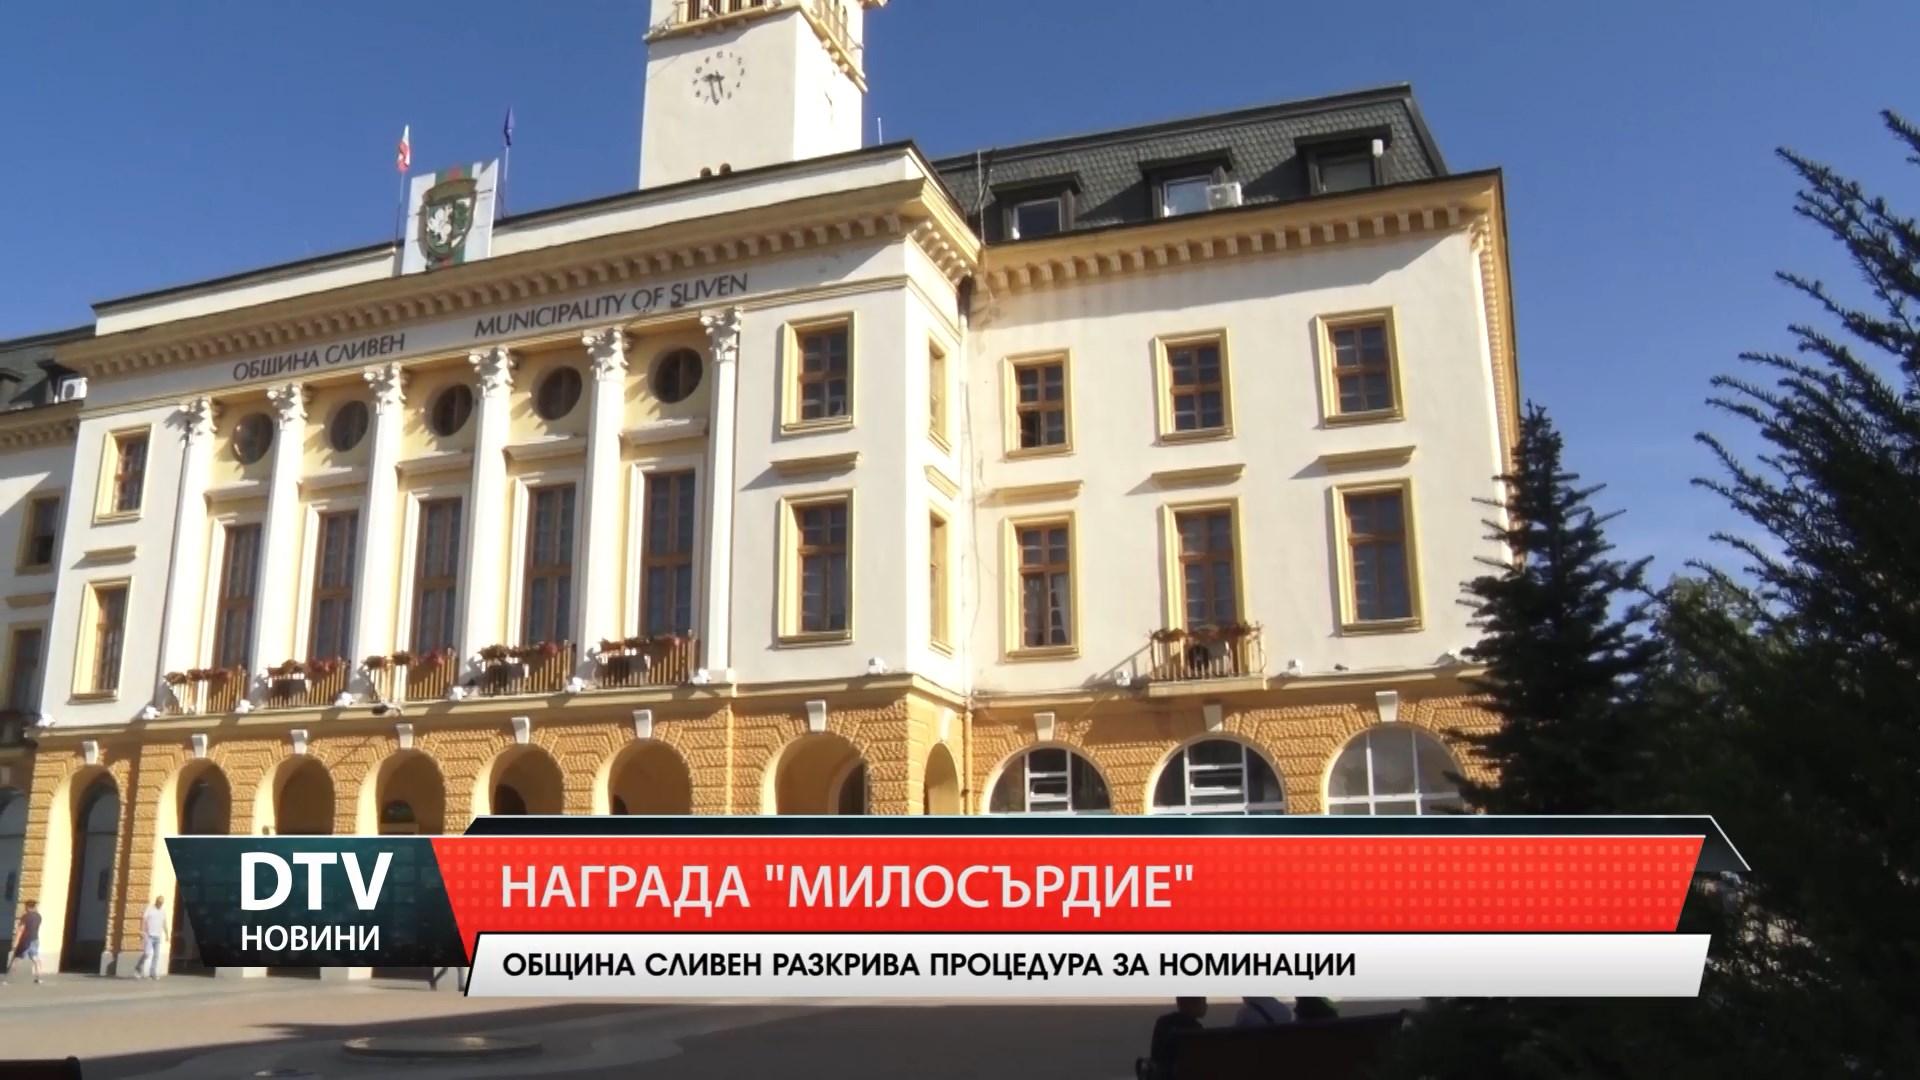 "Община Сливен разкрива процедура за номинации за награда ""Милосърдие""."